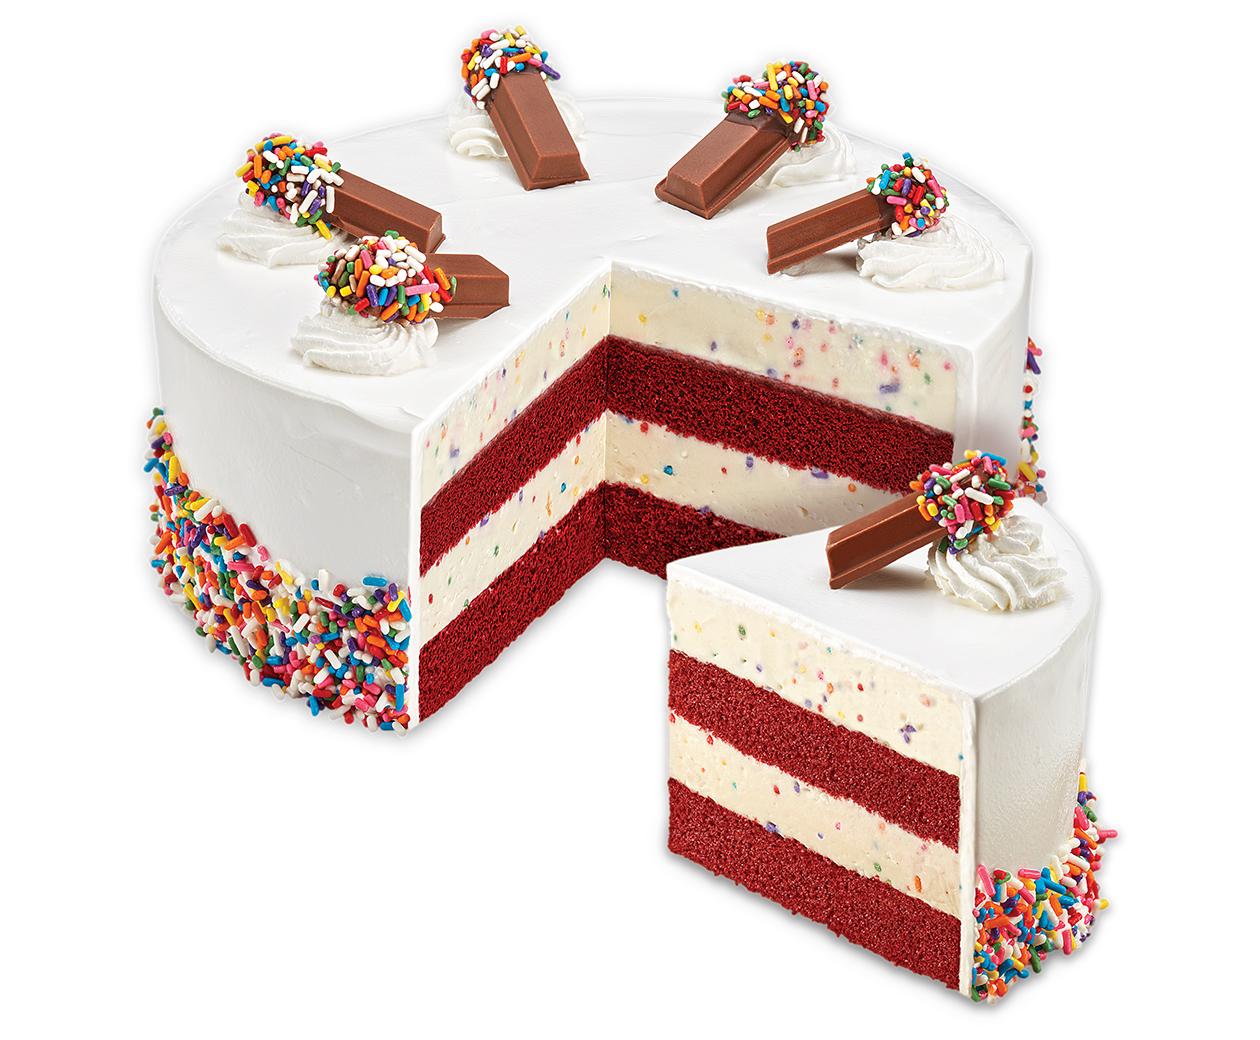 Cake - Lessons - Tes Teach